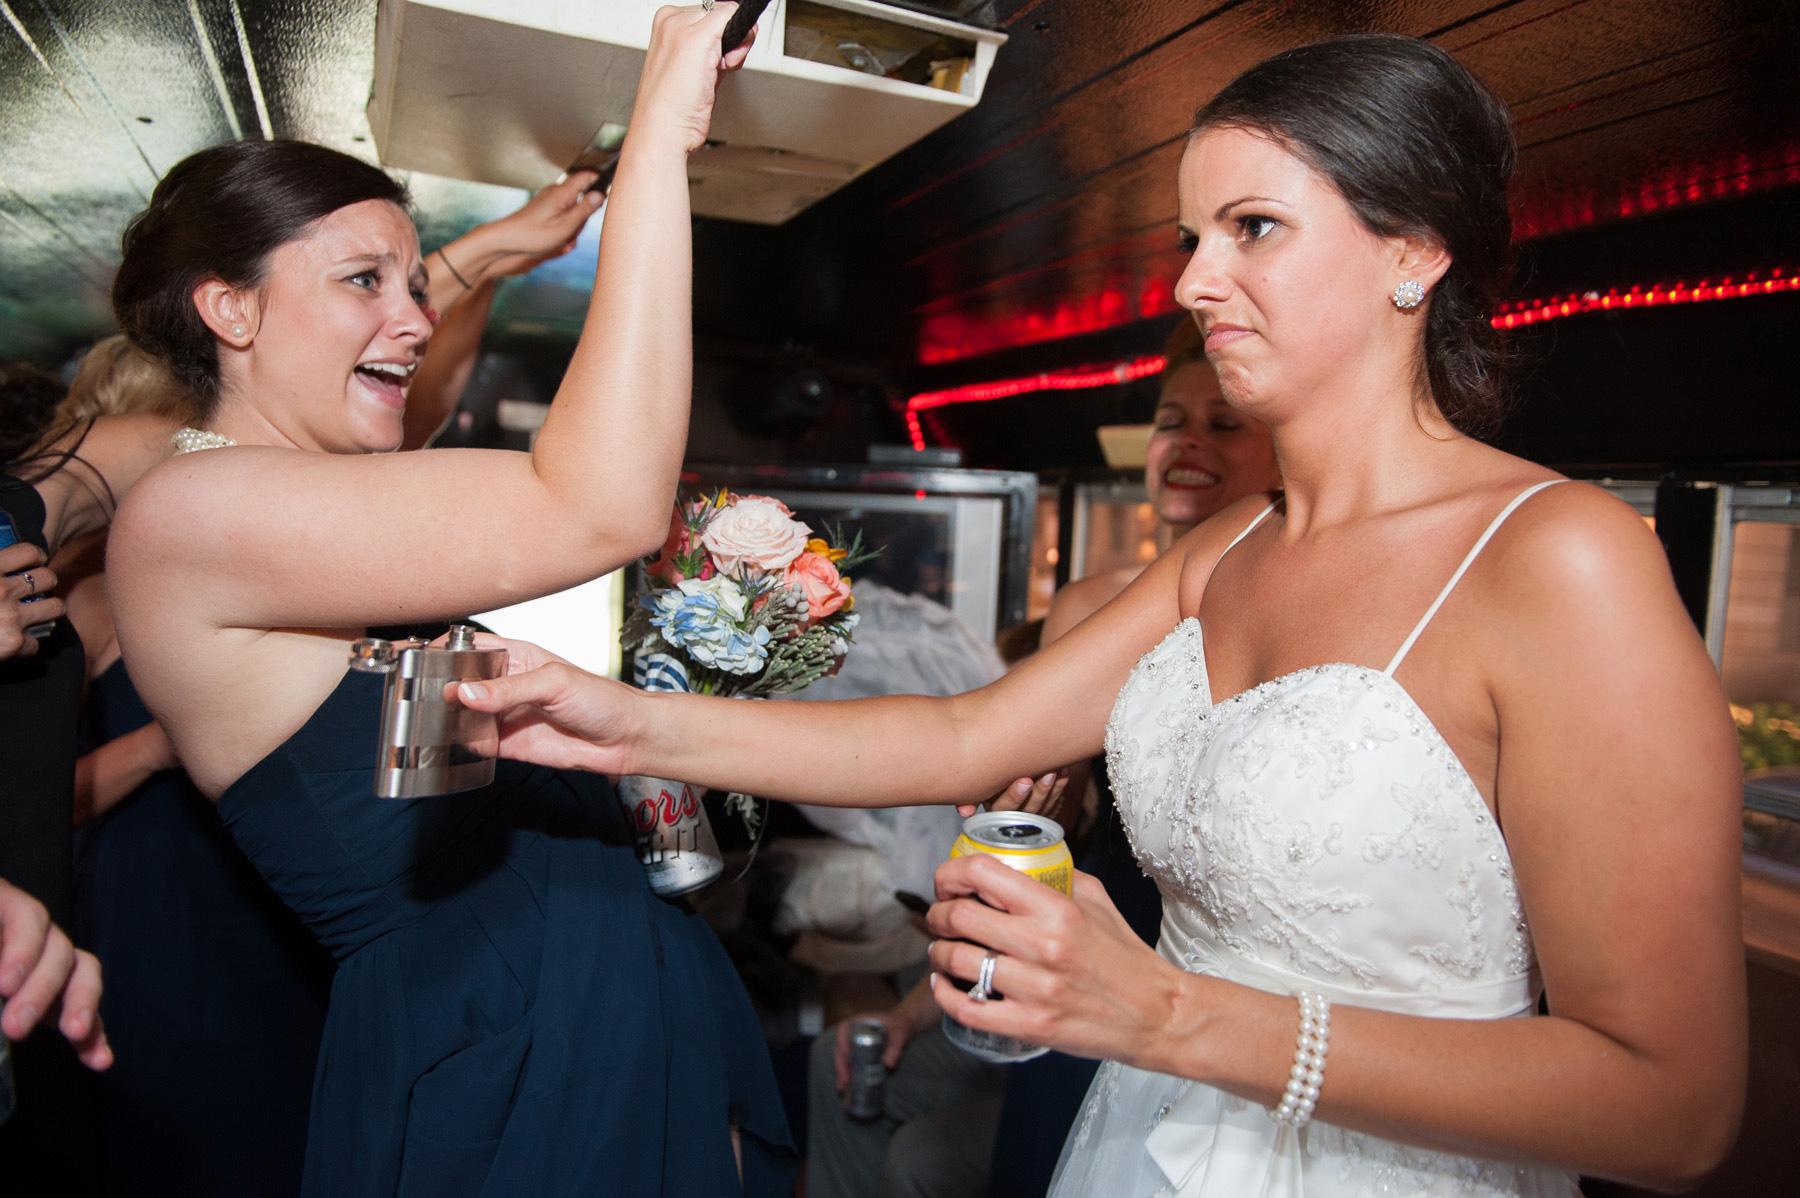 wedding-photography-saint-paul-mark-kegans-625.jpg